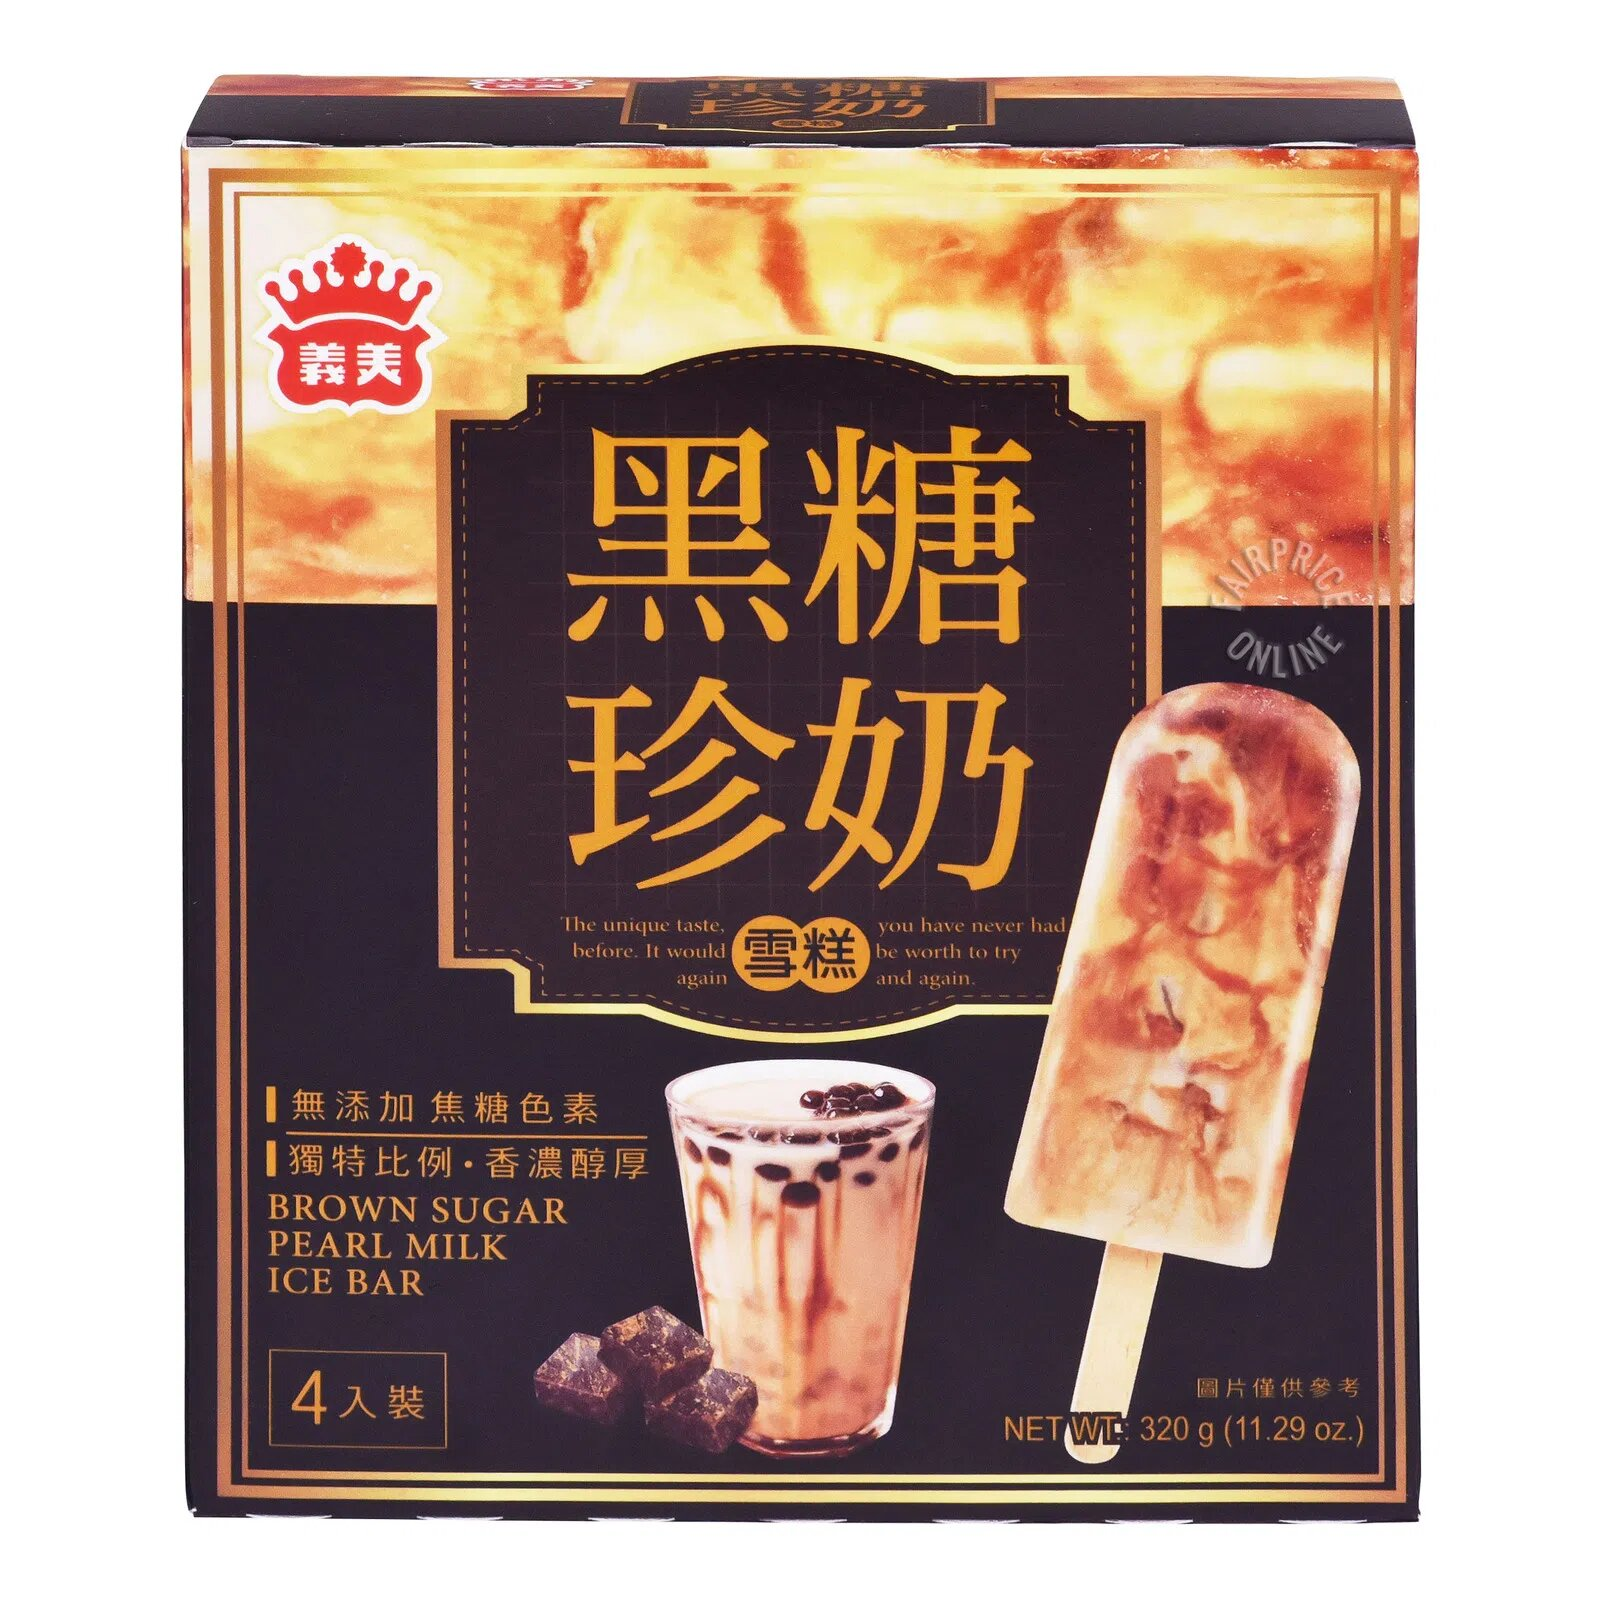 Imei Milk Ice Bar - Black Sugar Pearl